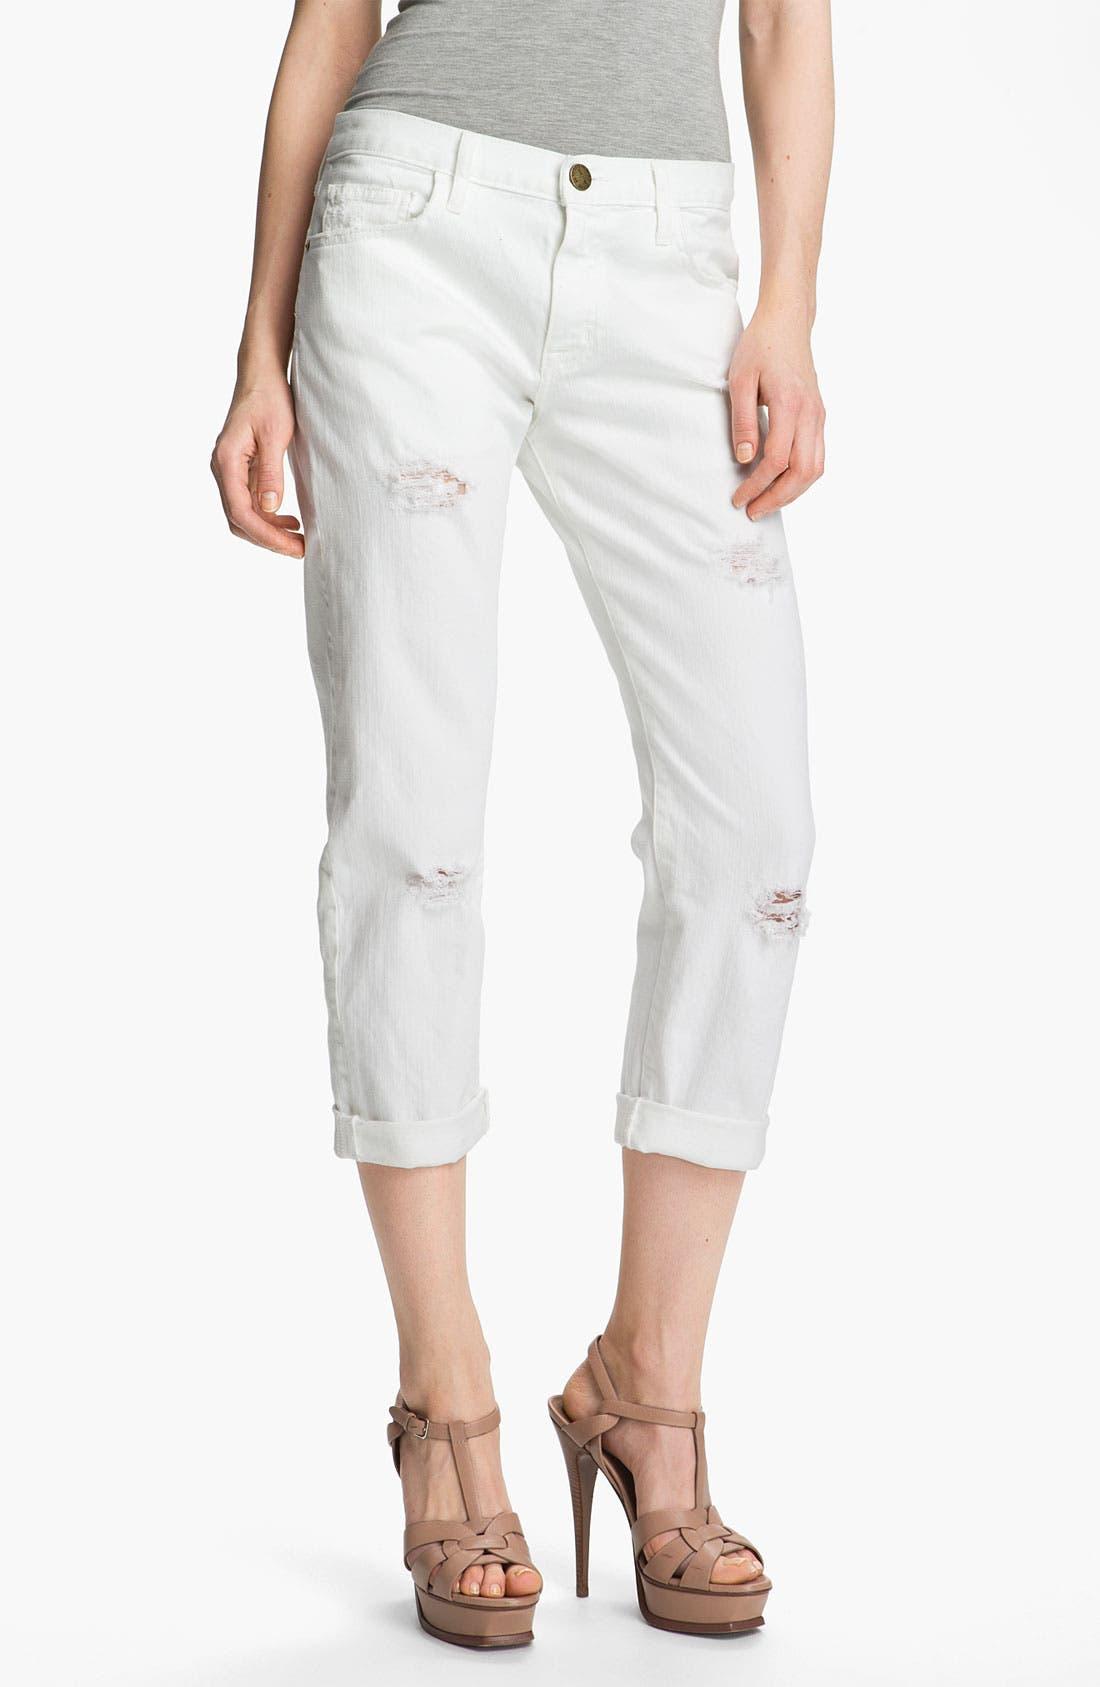 Main Image - Current/Elliott 'The Boyfriend Jean' Stretch Jeans (Sugar)